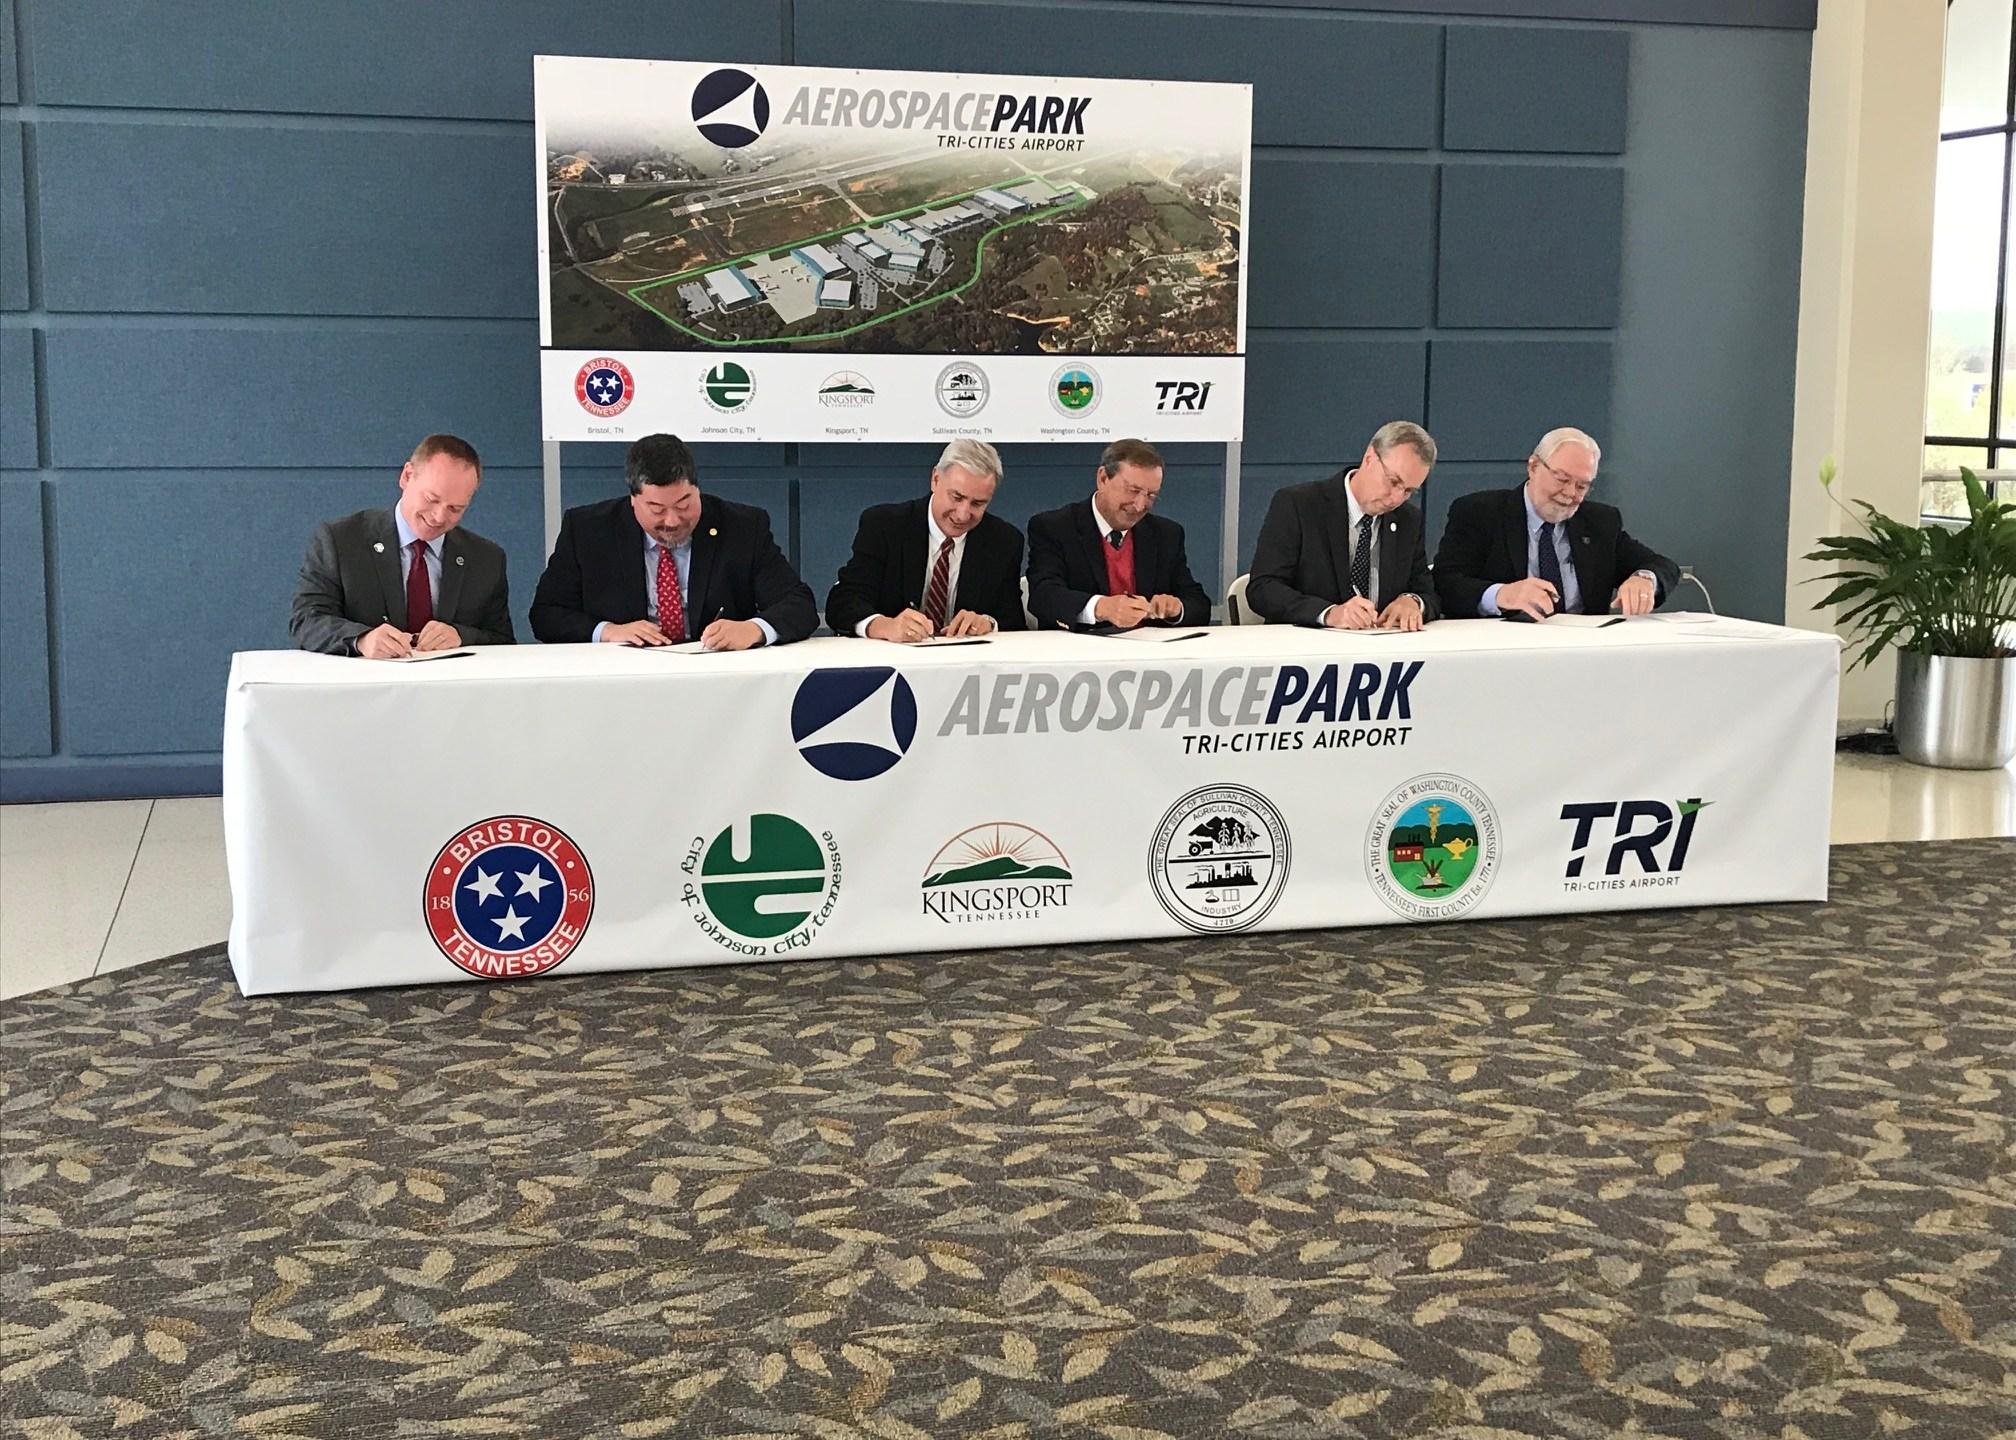 Aerospace Park_433179